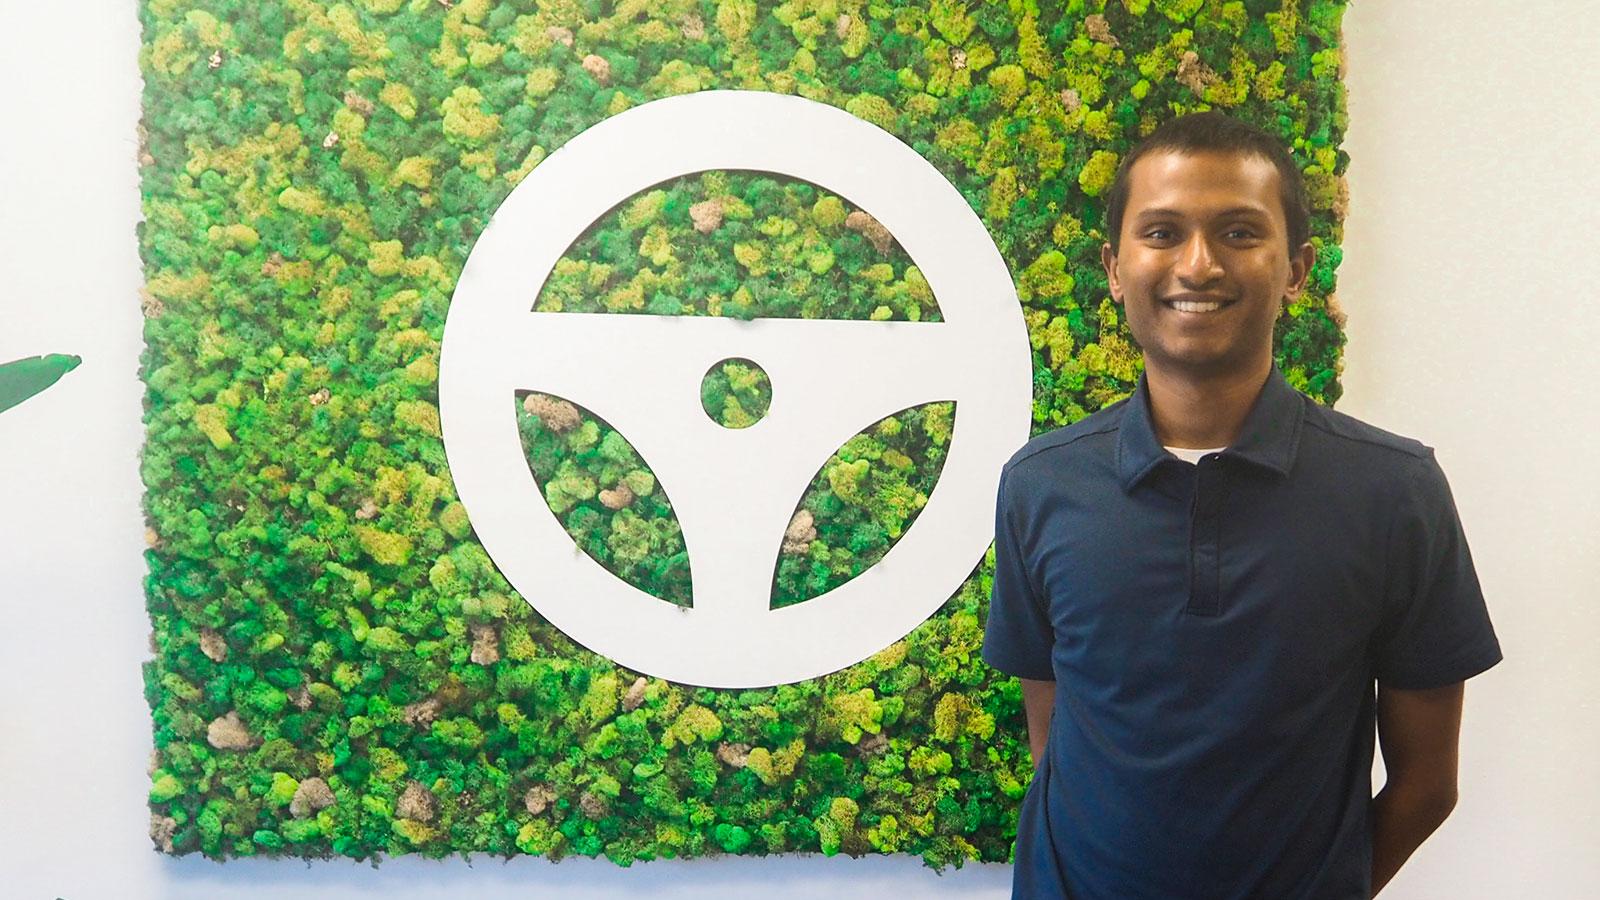 APIで車生活を便利にし、車関連サービス業務を効率化するSmartcar